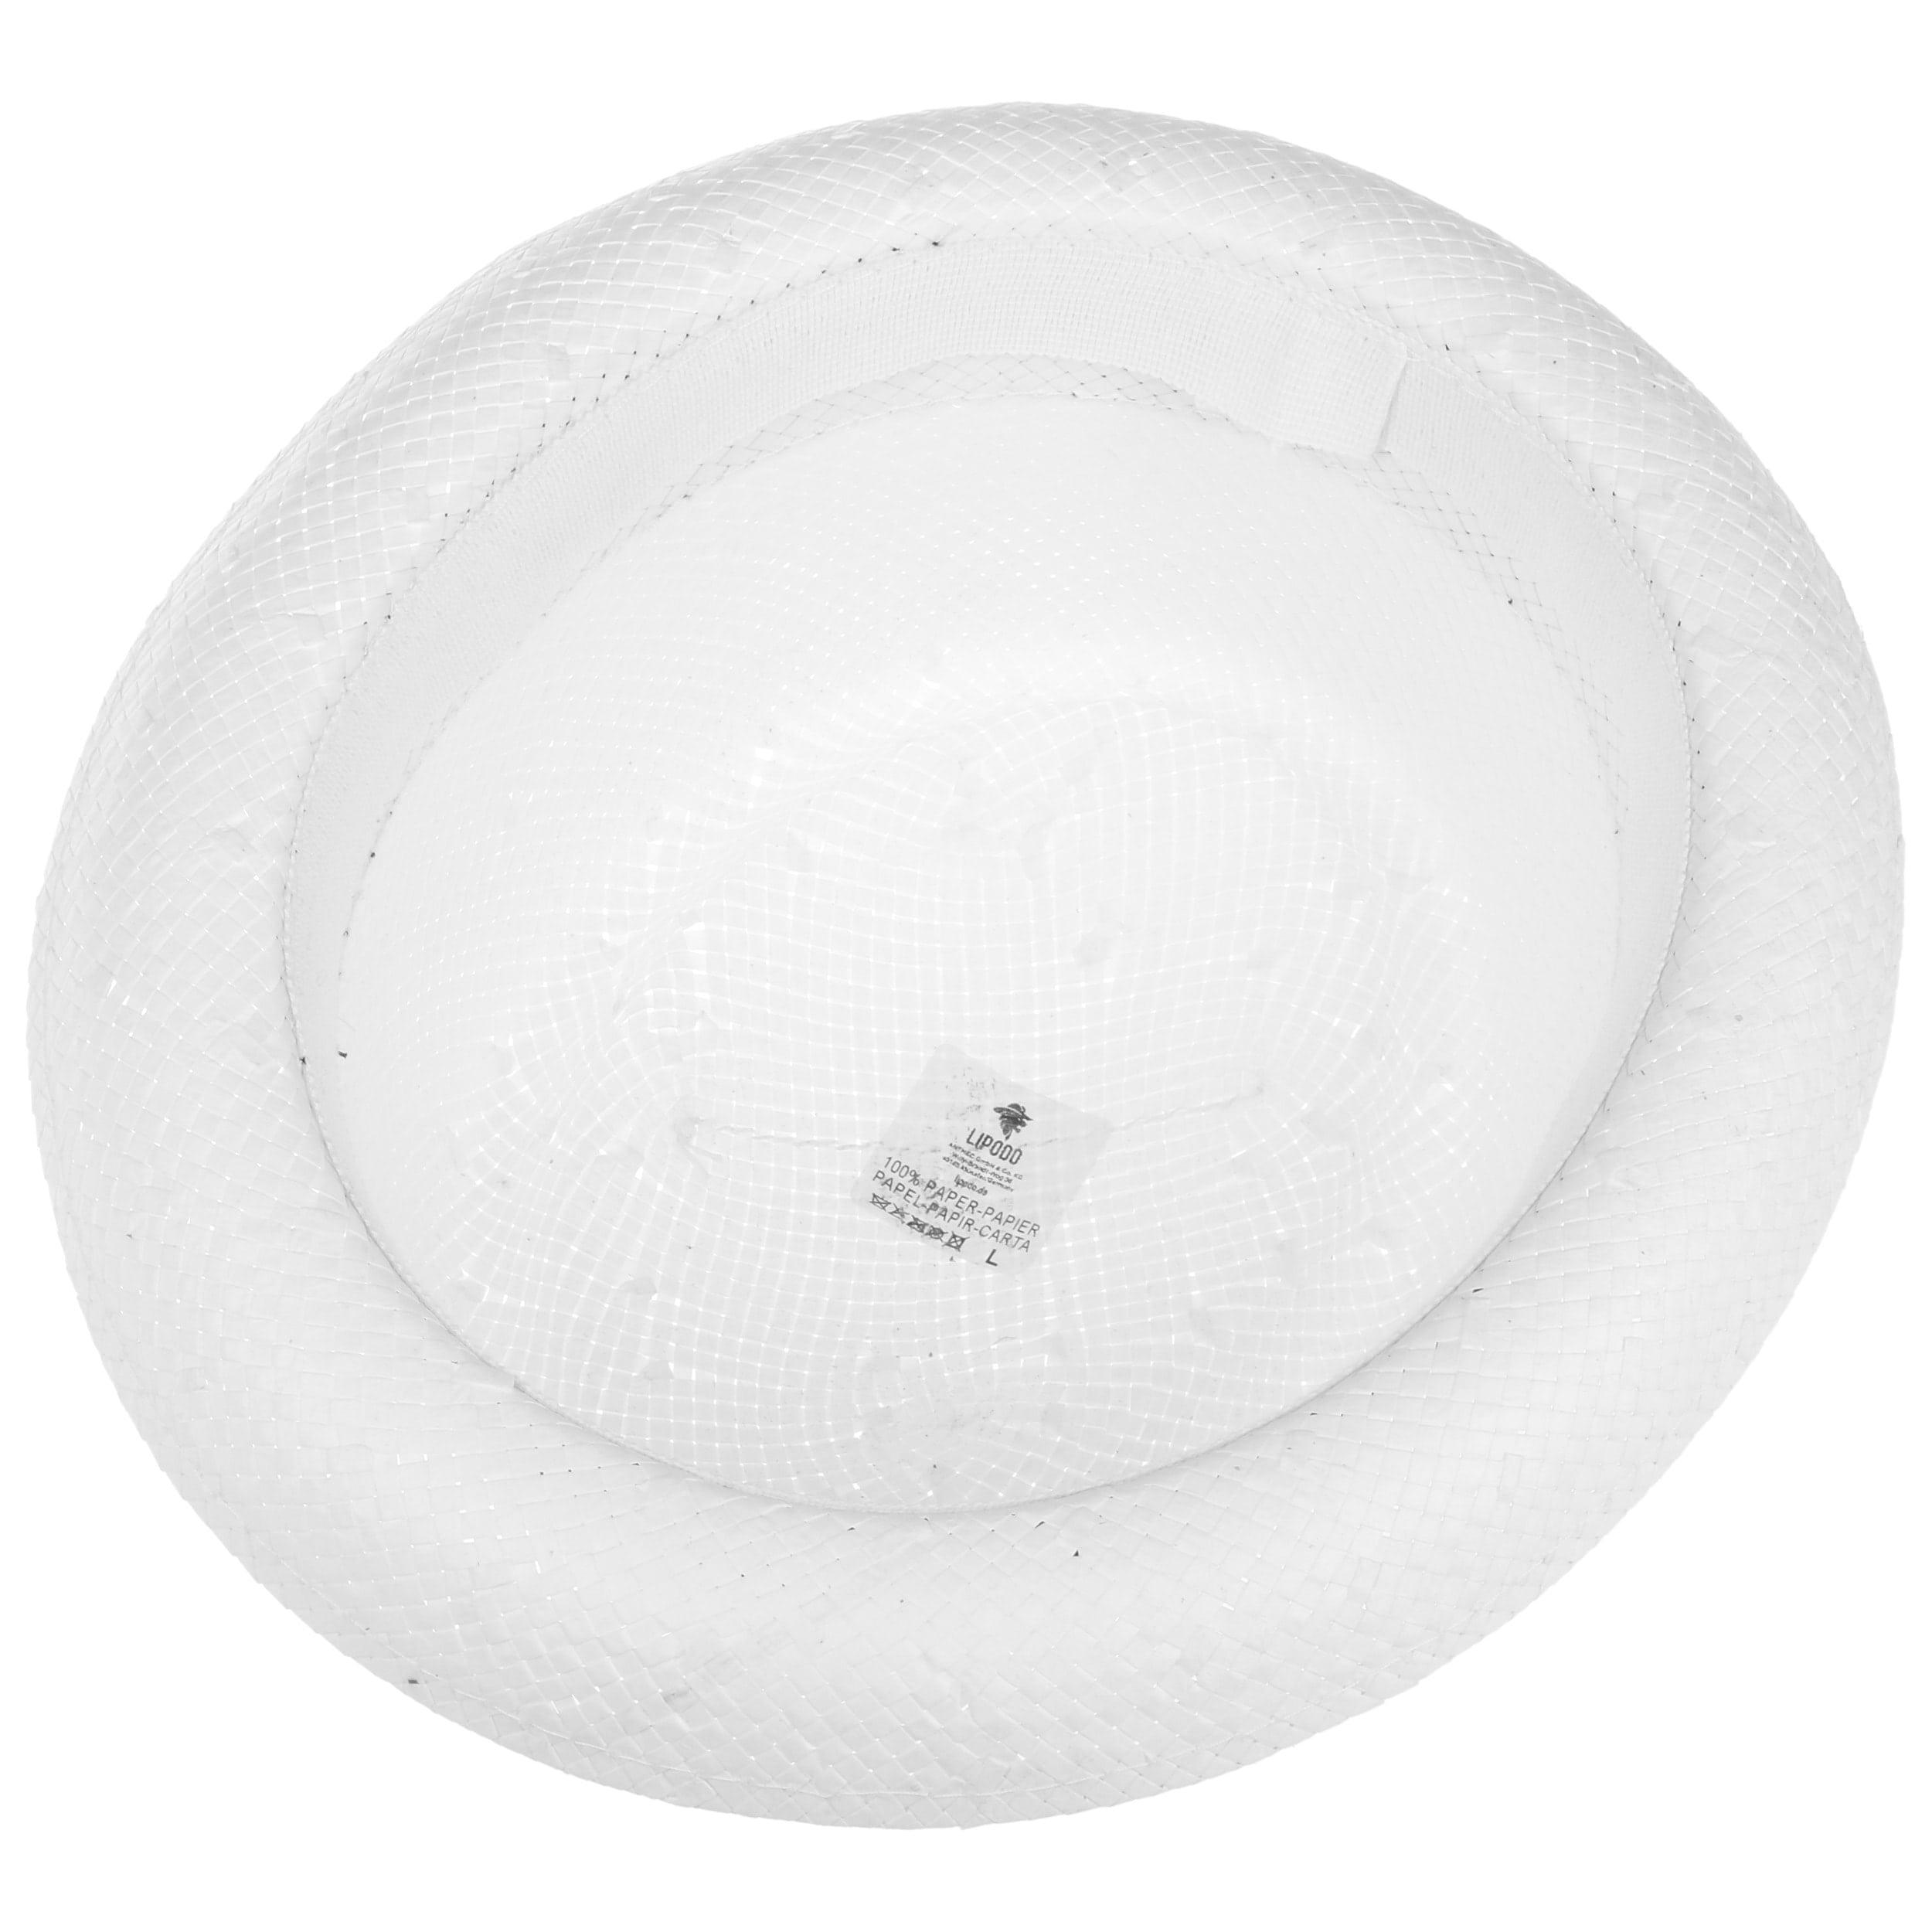 34f3d2c0a7f ... Acapulco White Pork Pie Hat by Lipodo - white 2 ...